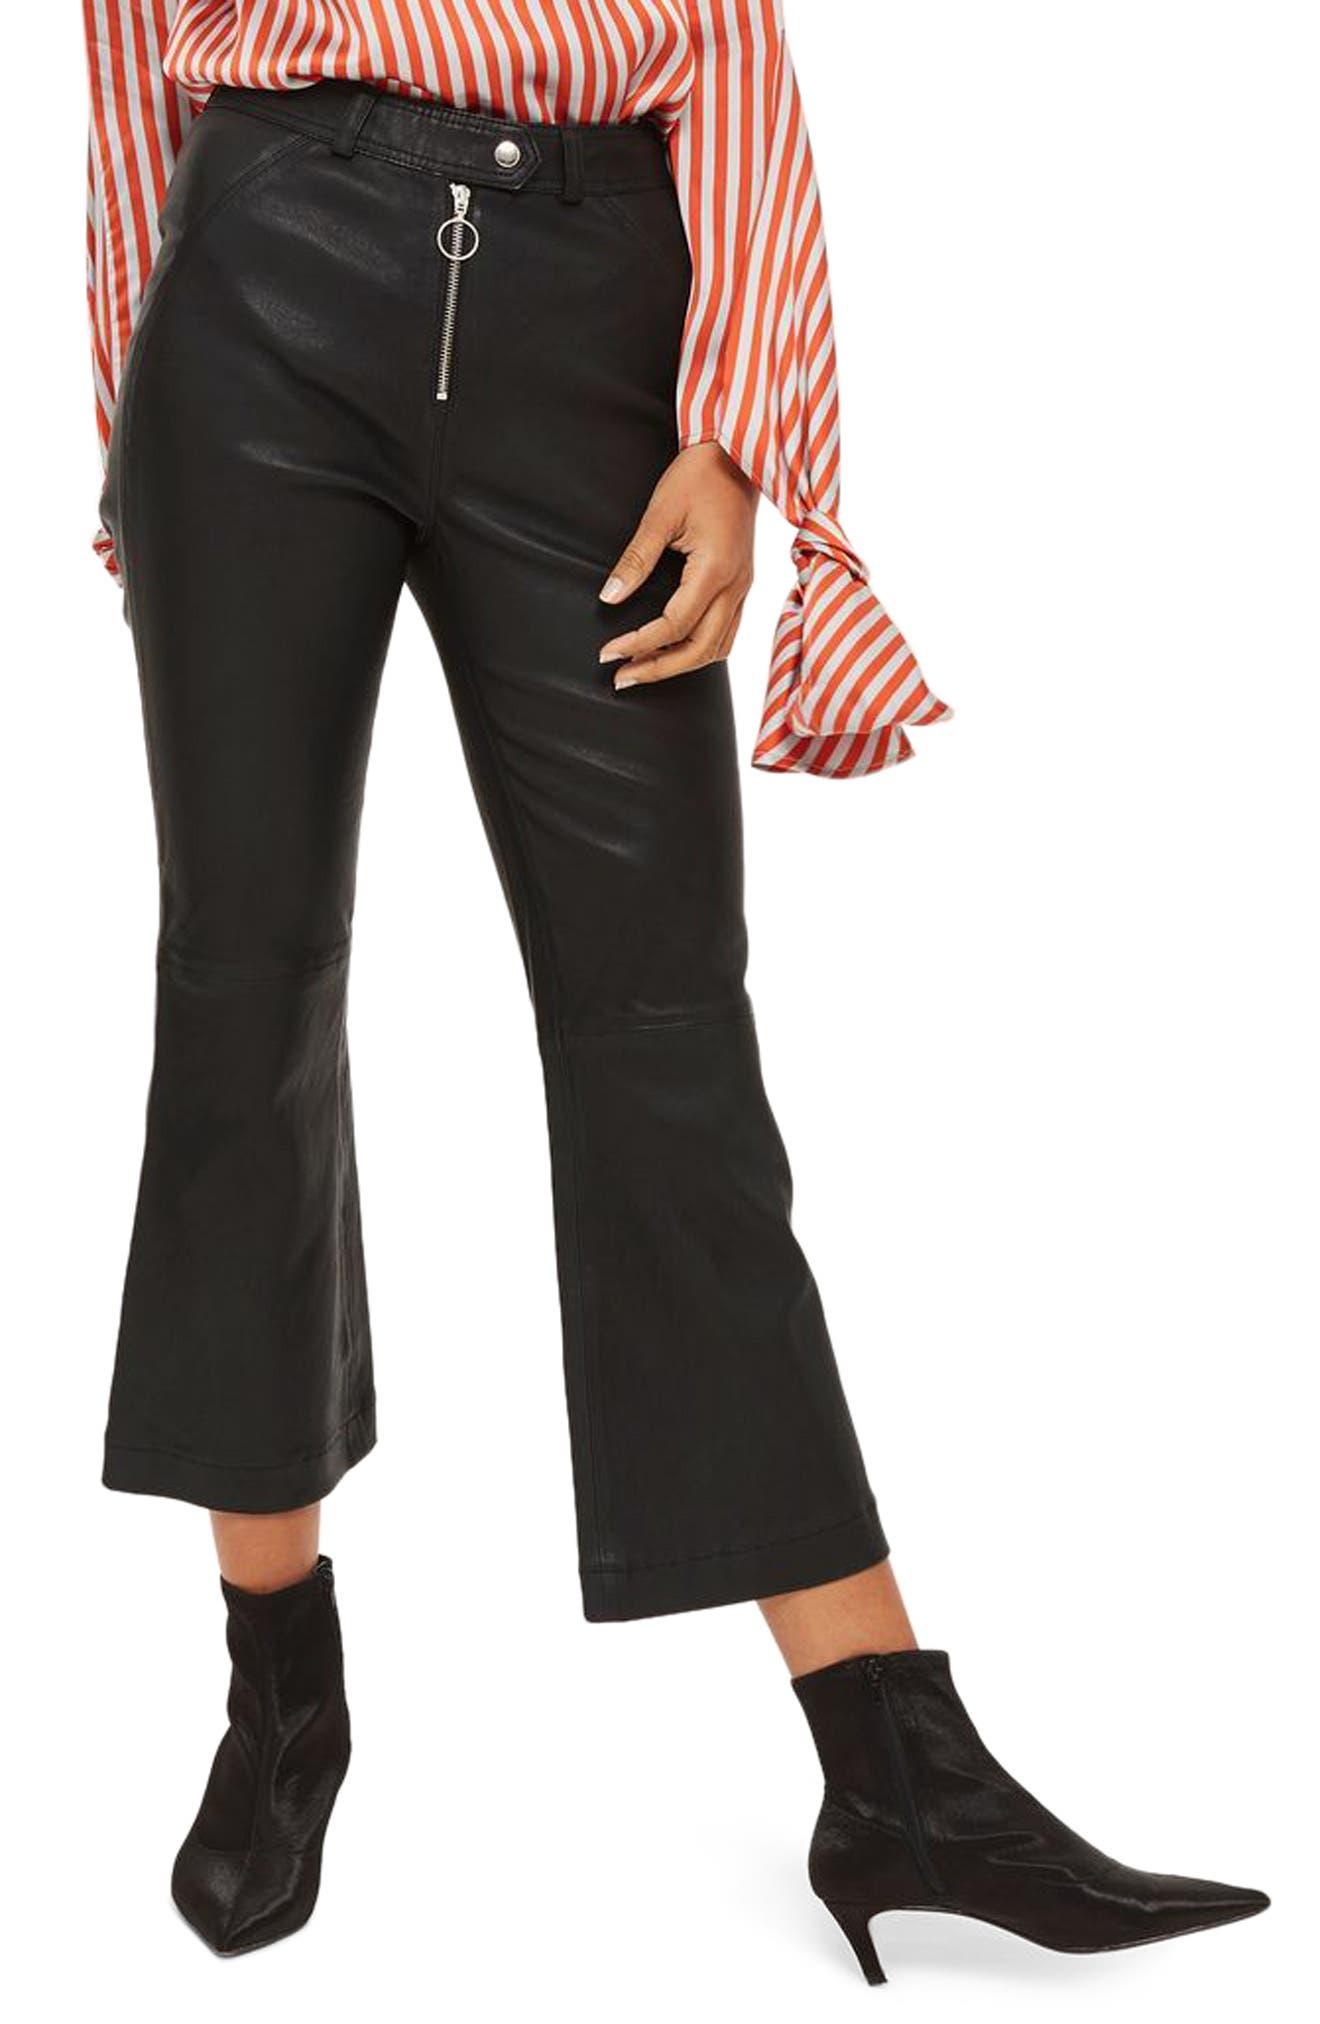 Topshop Premium Kick Flare Crop Leather Pants